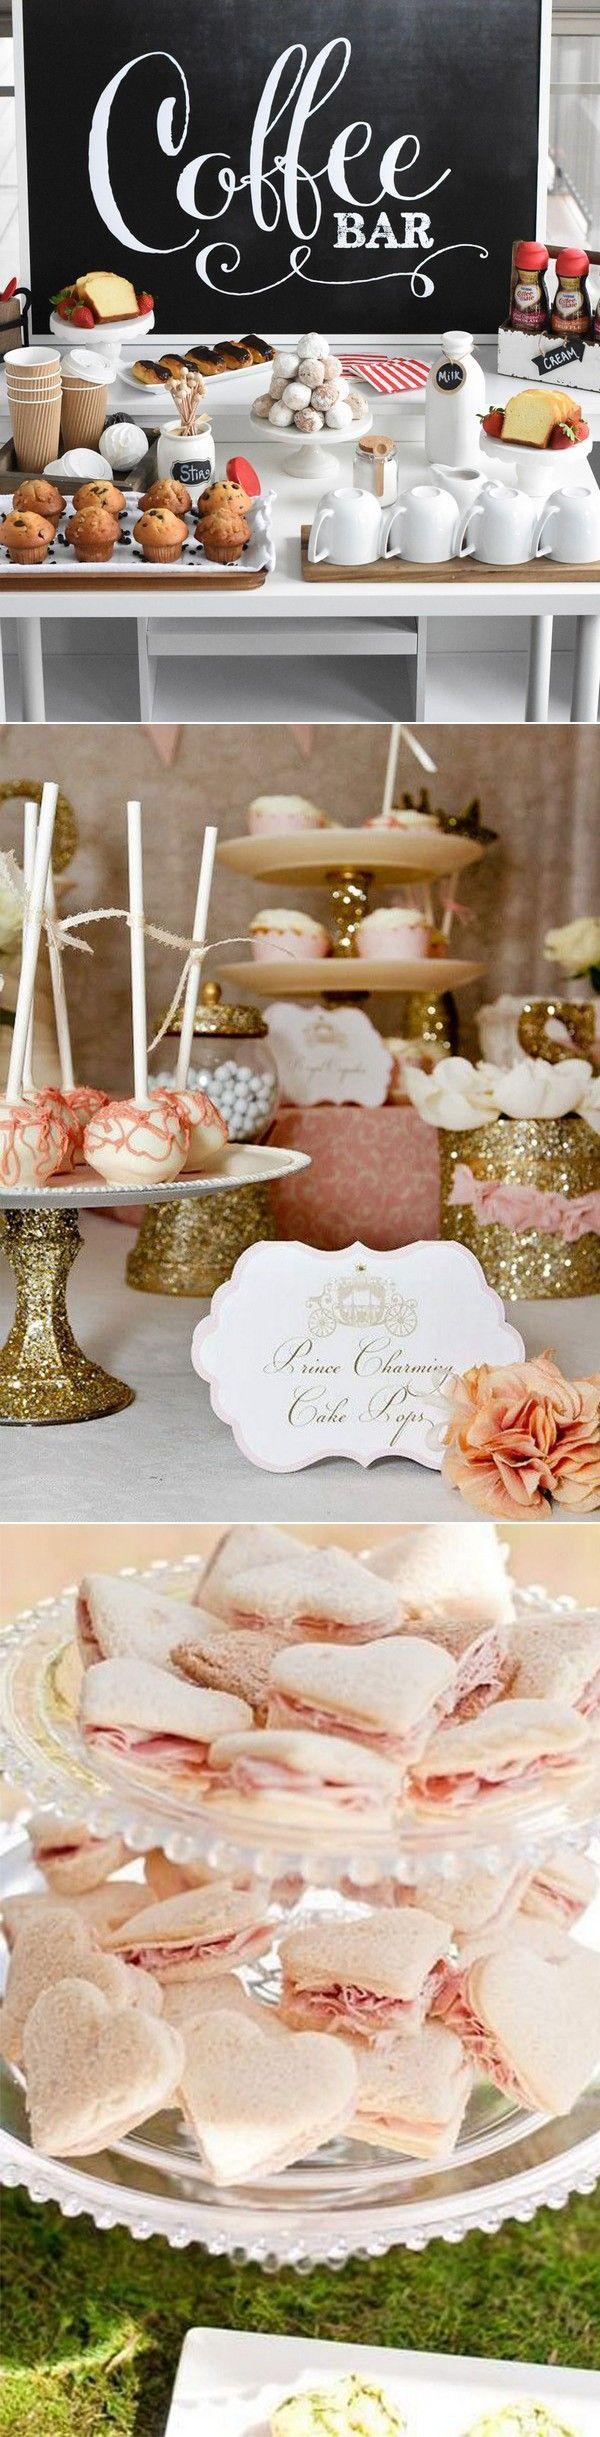 Wedding favors ideas tumblr - Top 20 Bridal Shower Ideas She Ll Love